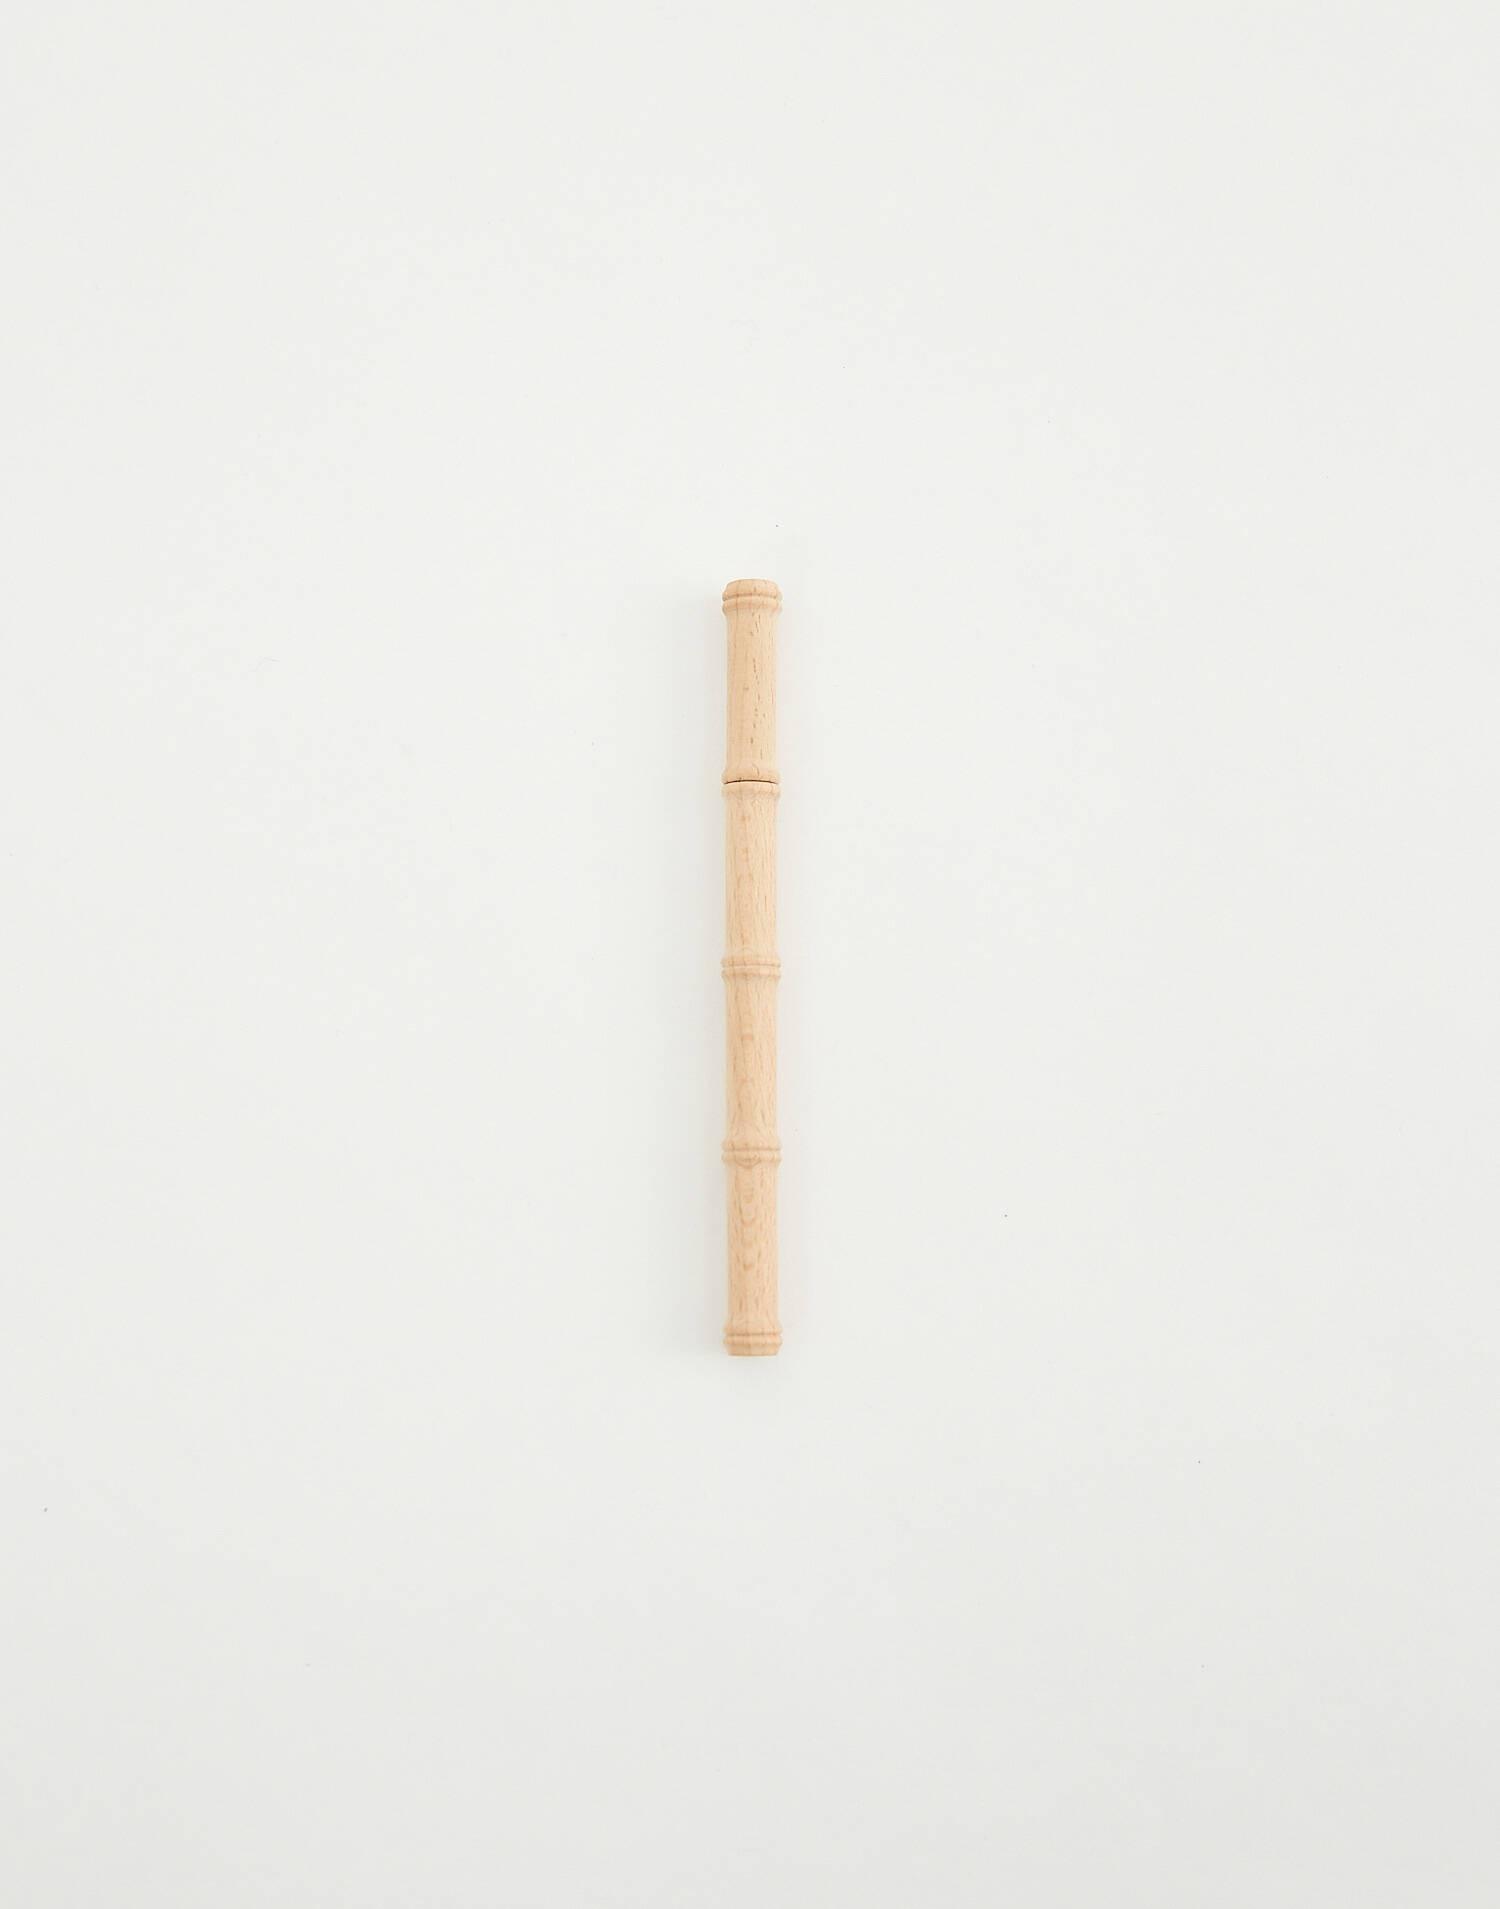 Bamboo shaped pen